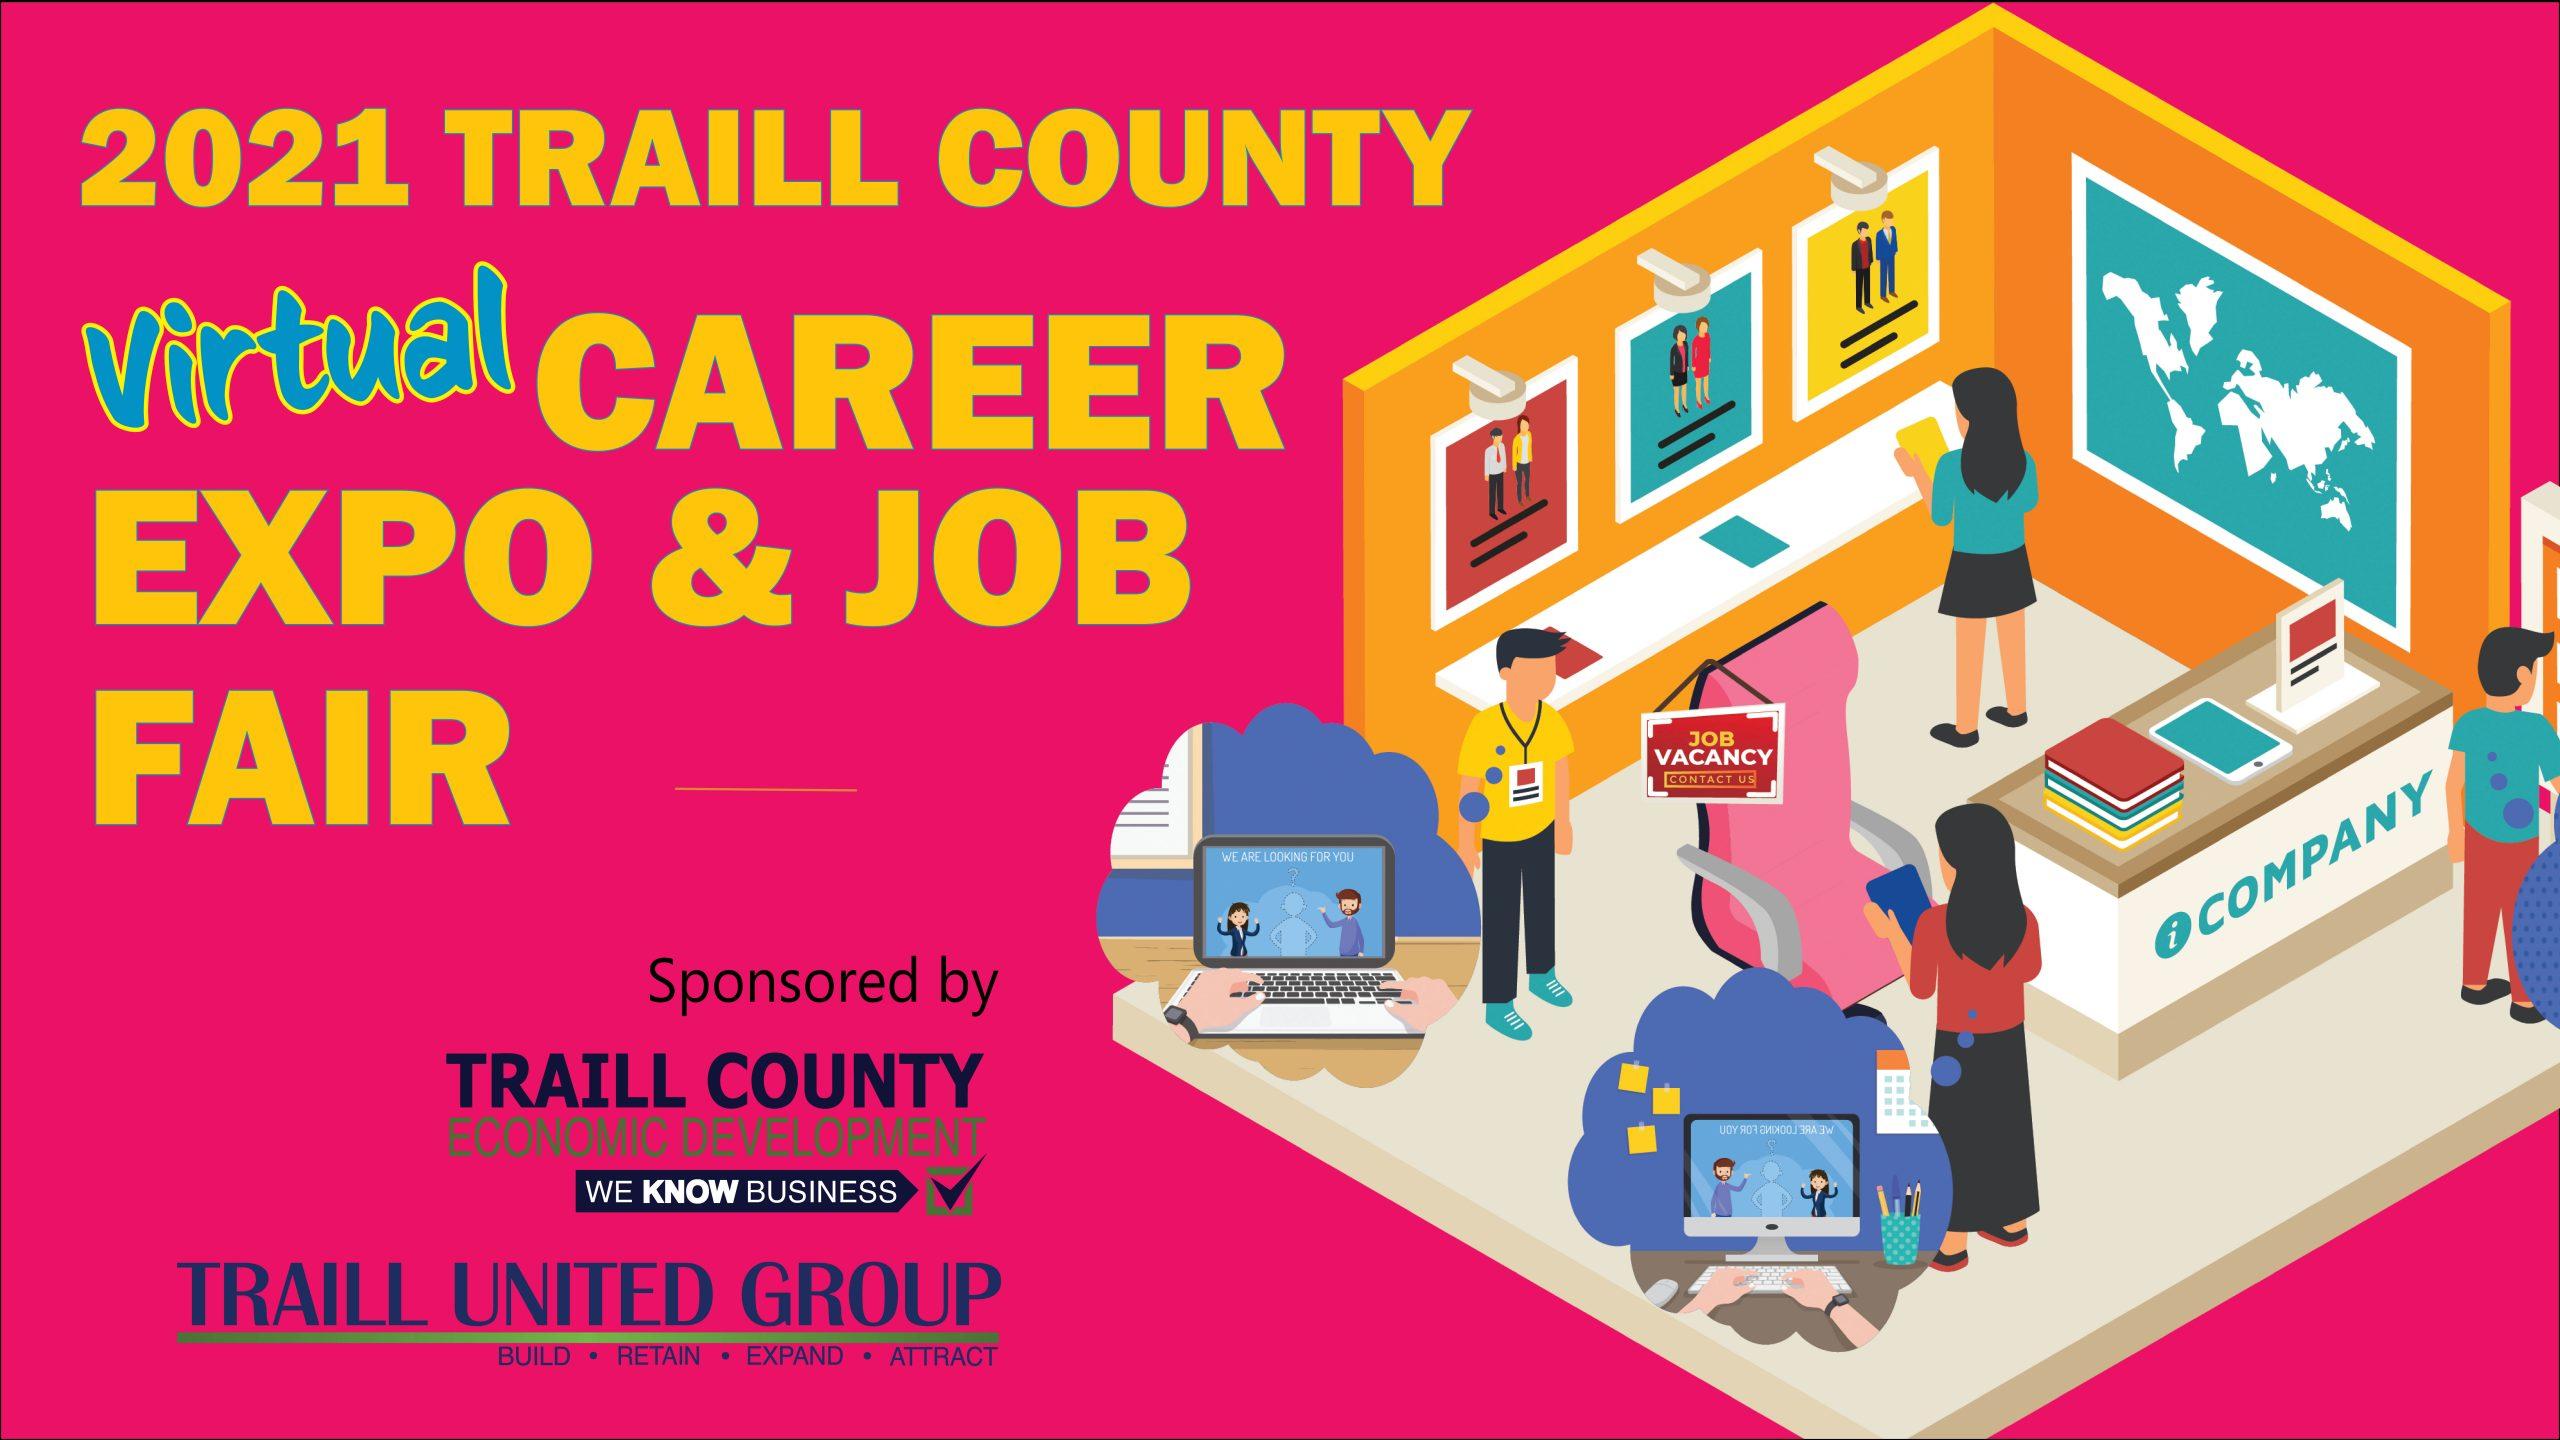 2021 Virtual Career Expo & Job Fair